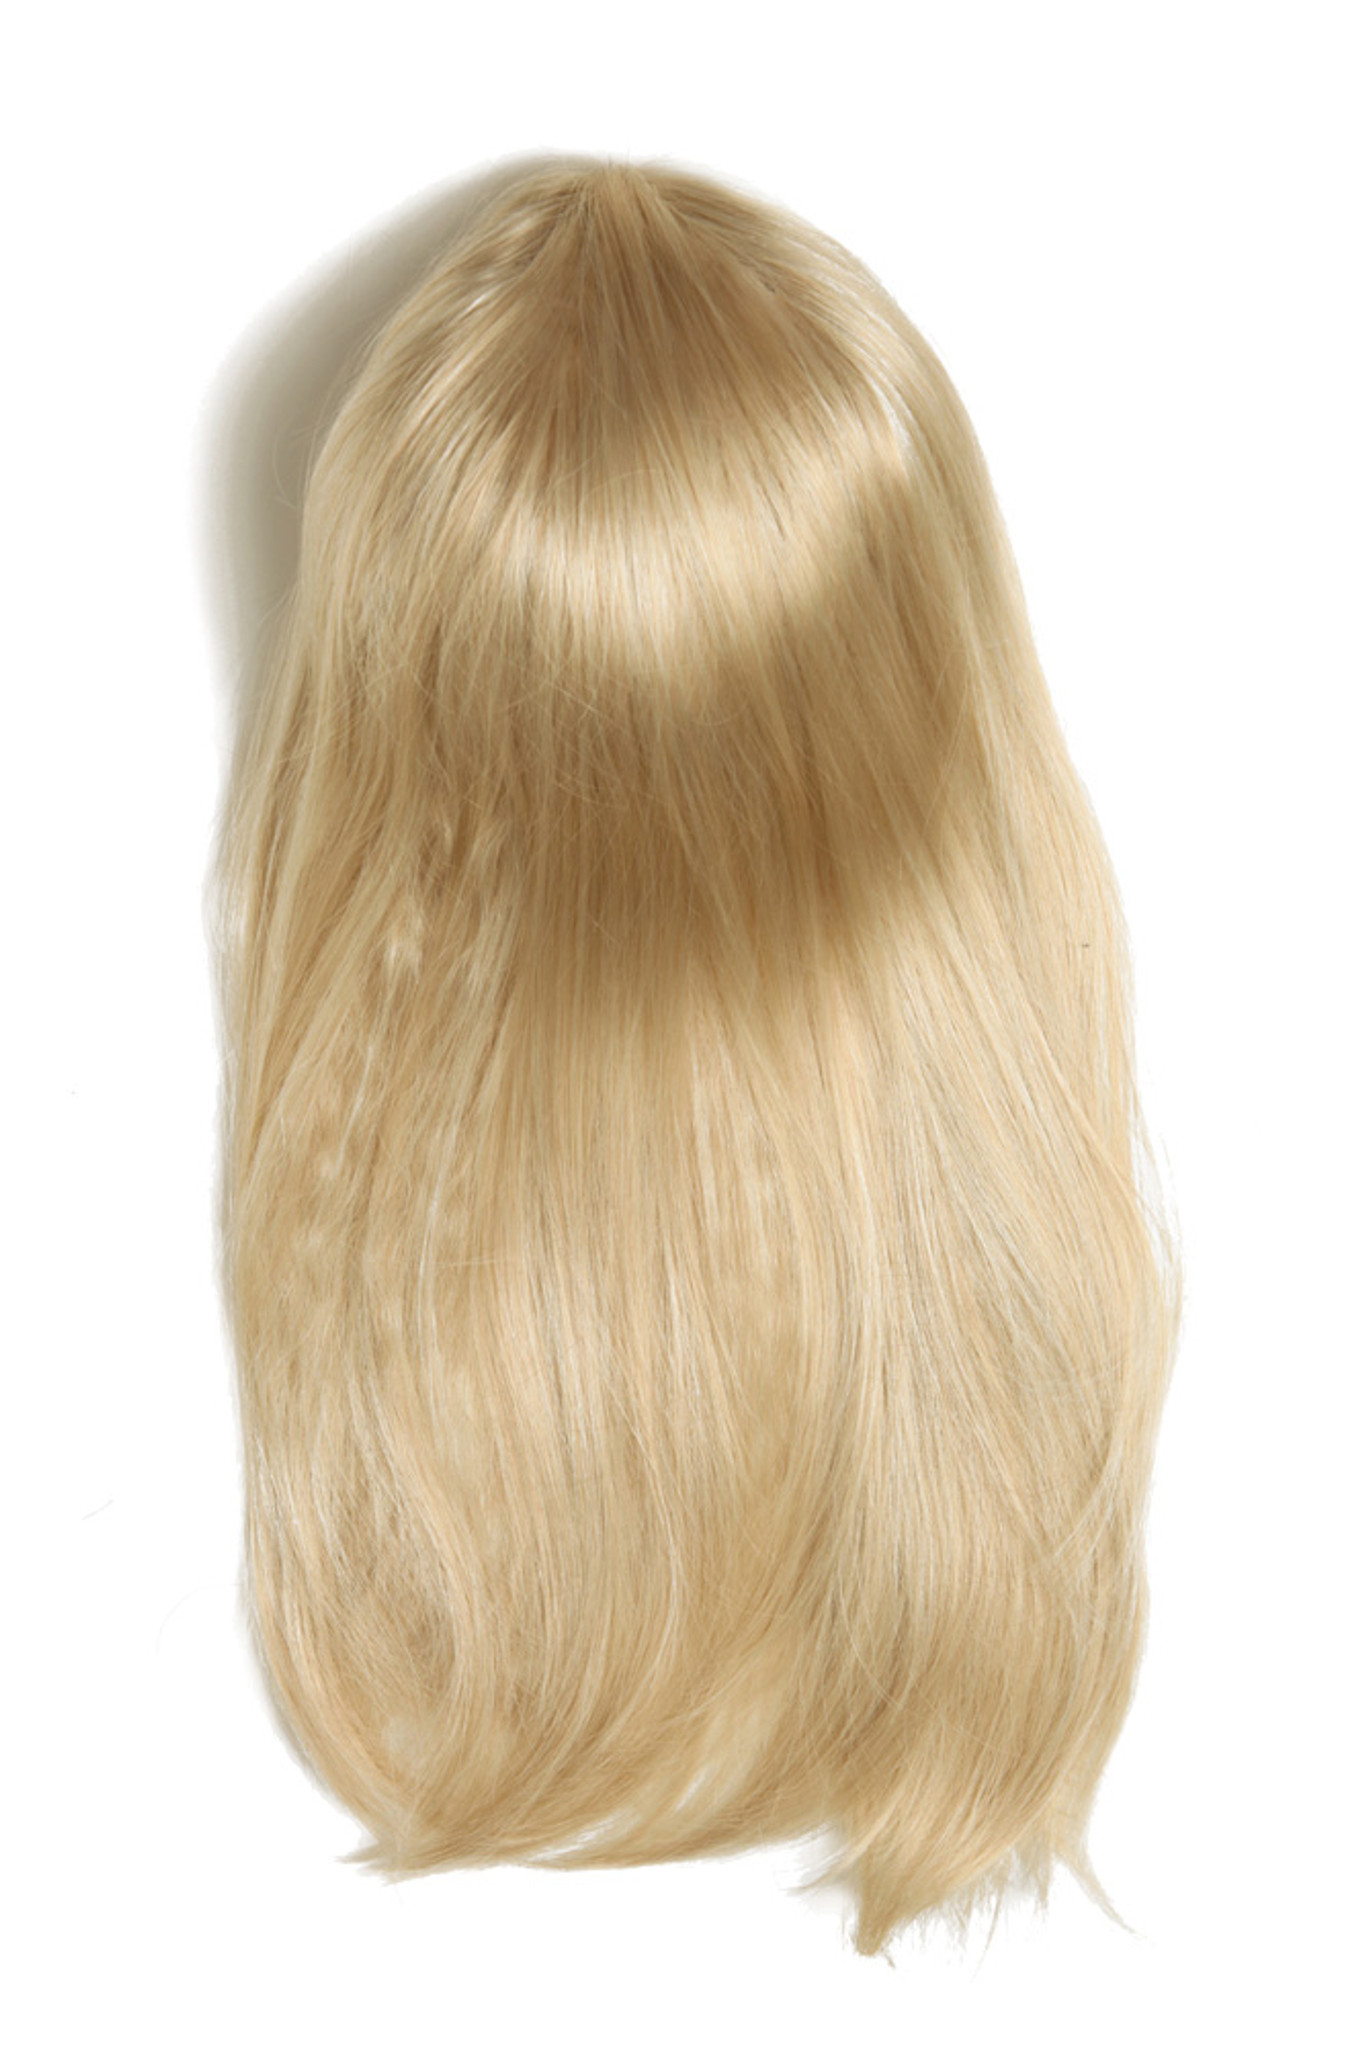 Louis Ferre Brigitte Dream Wig Collection ¾ Wig